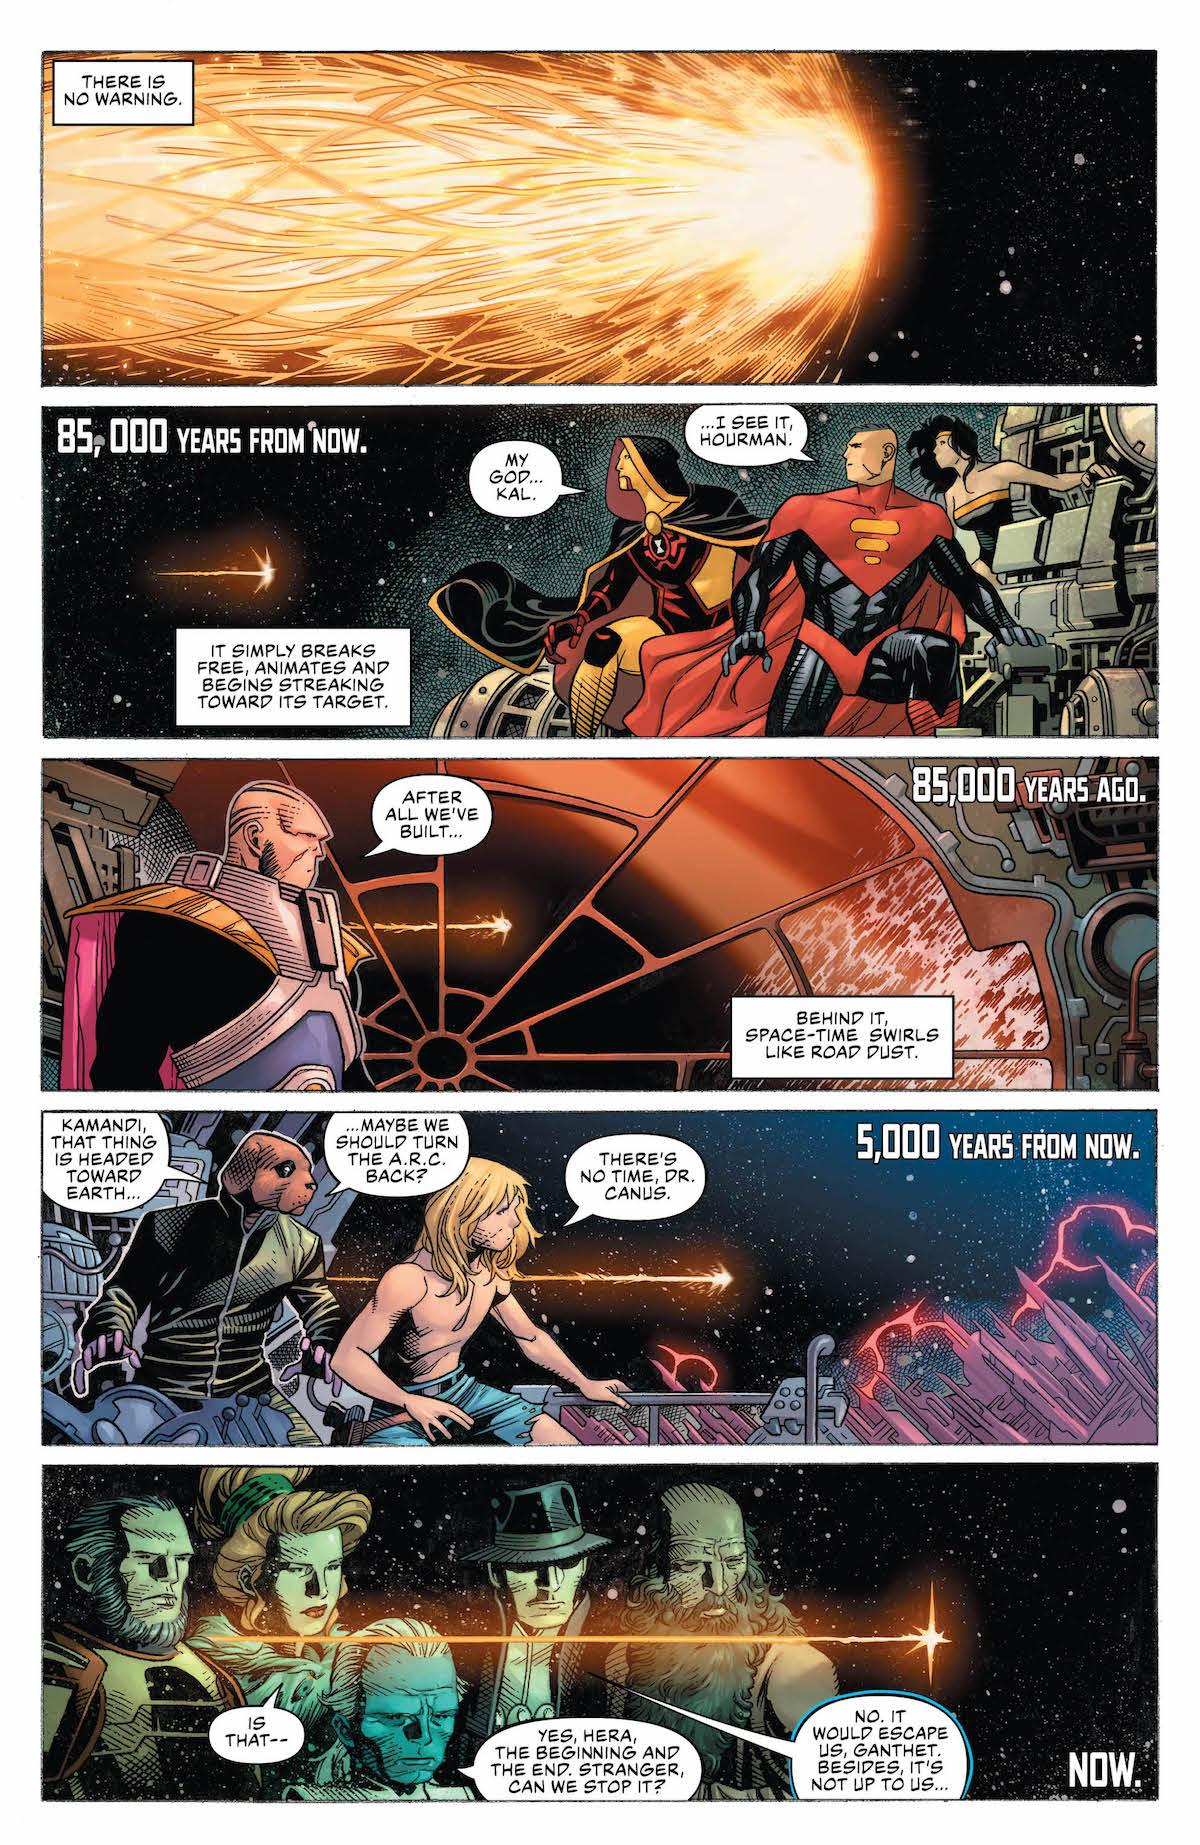 Justice League #1 page 1